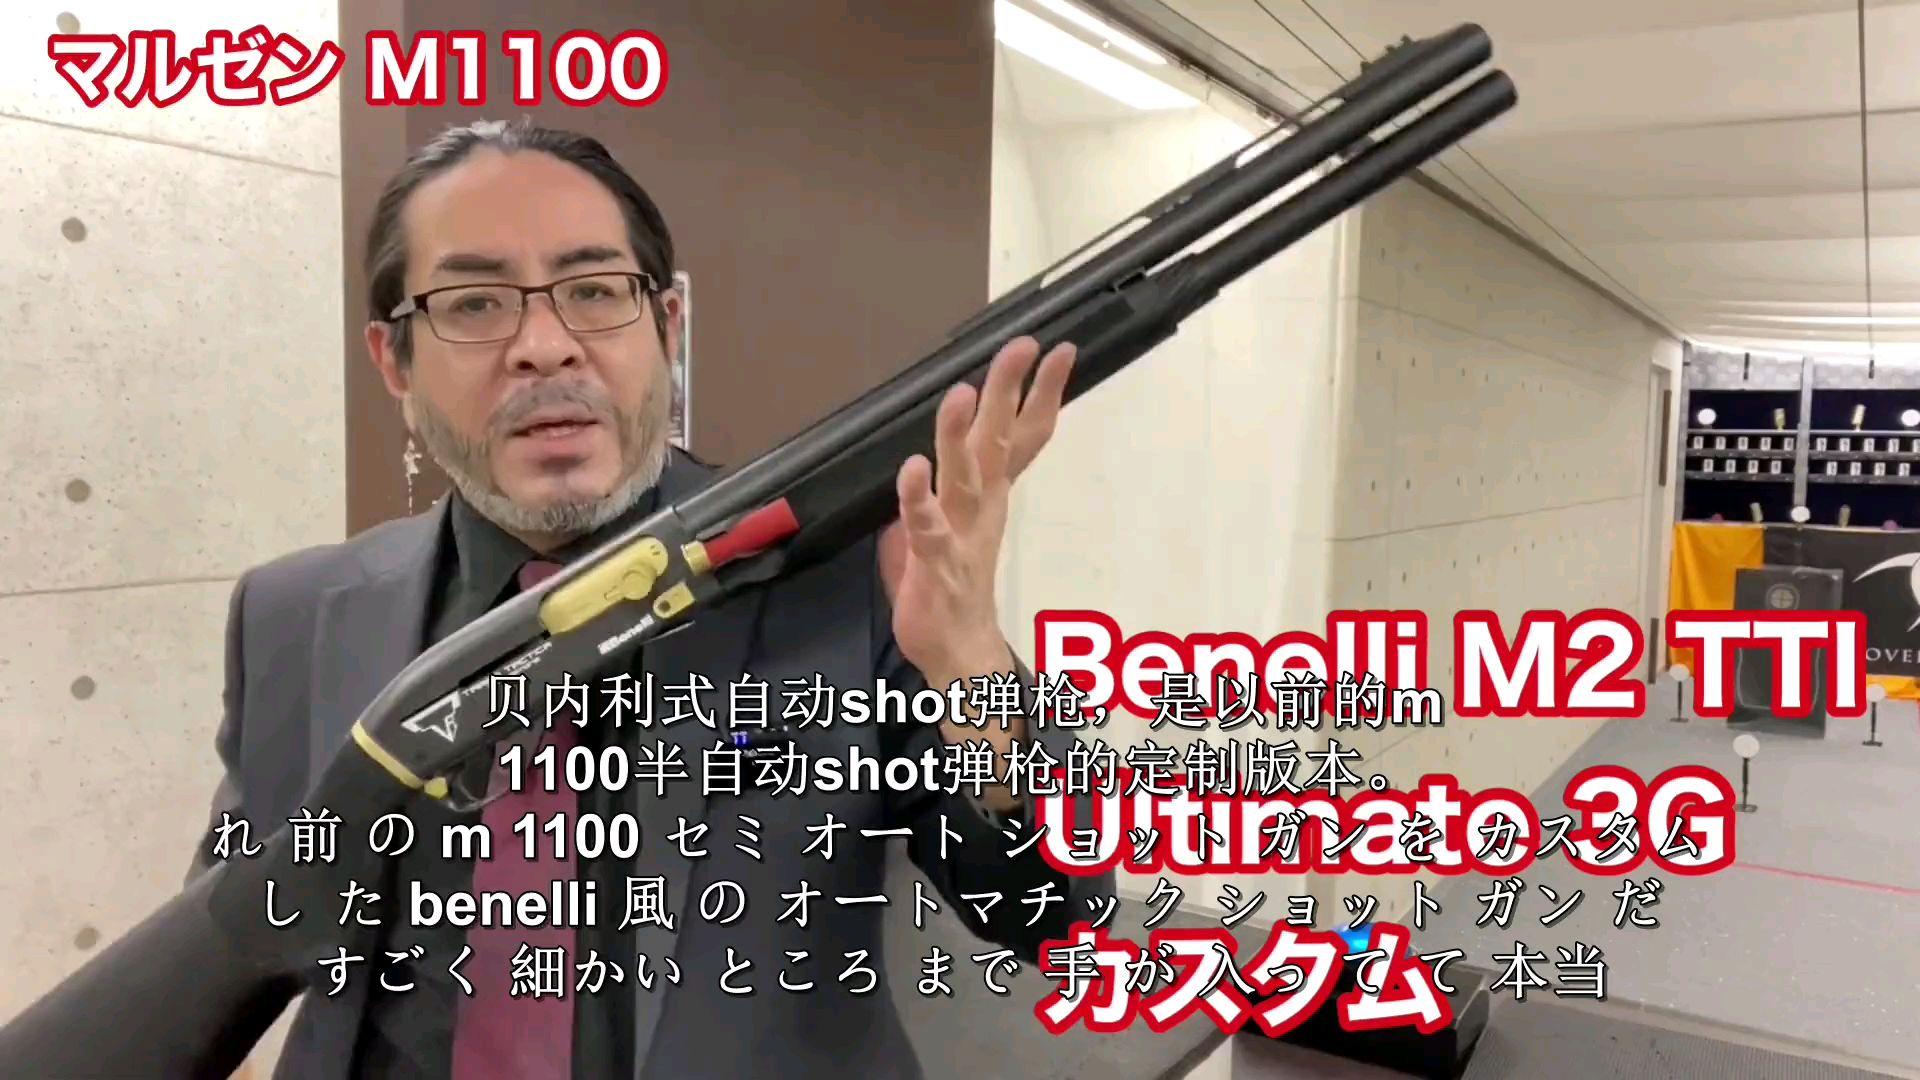 [油管搬运]Airsoft版Benelli M2 TTI